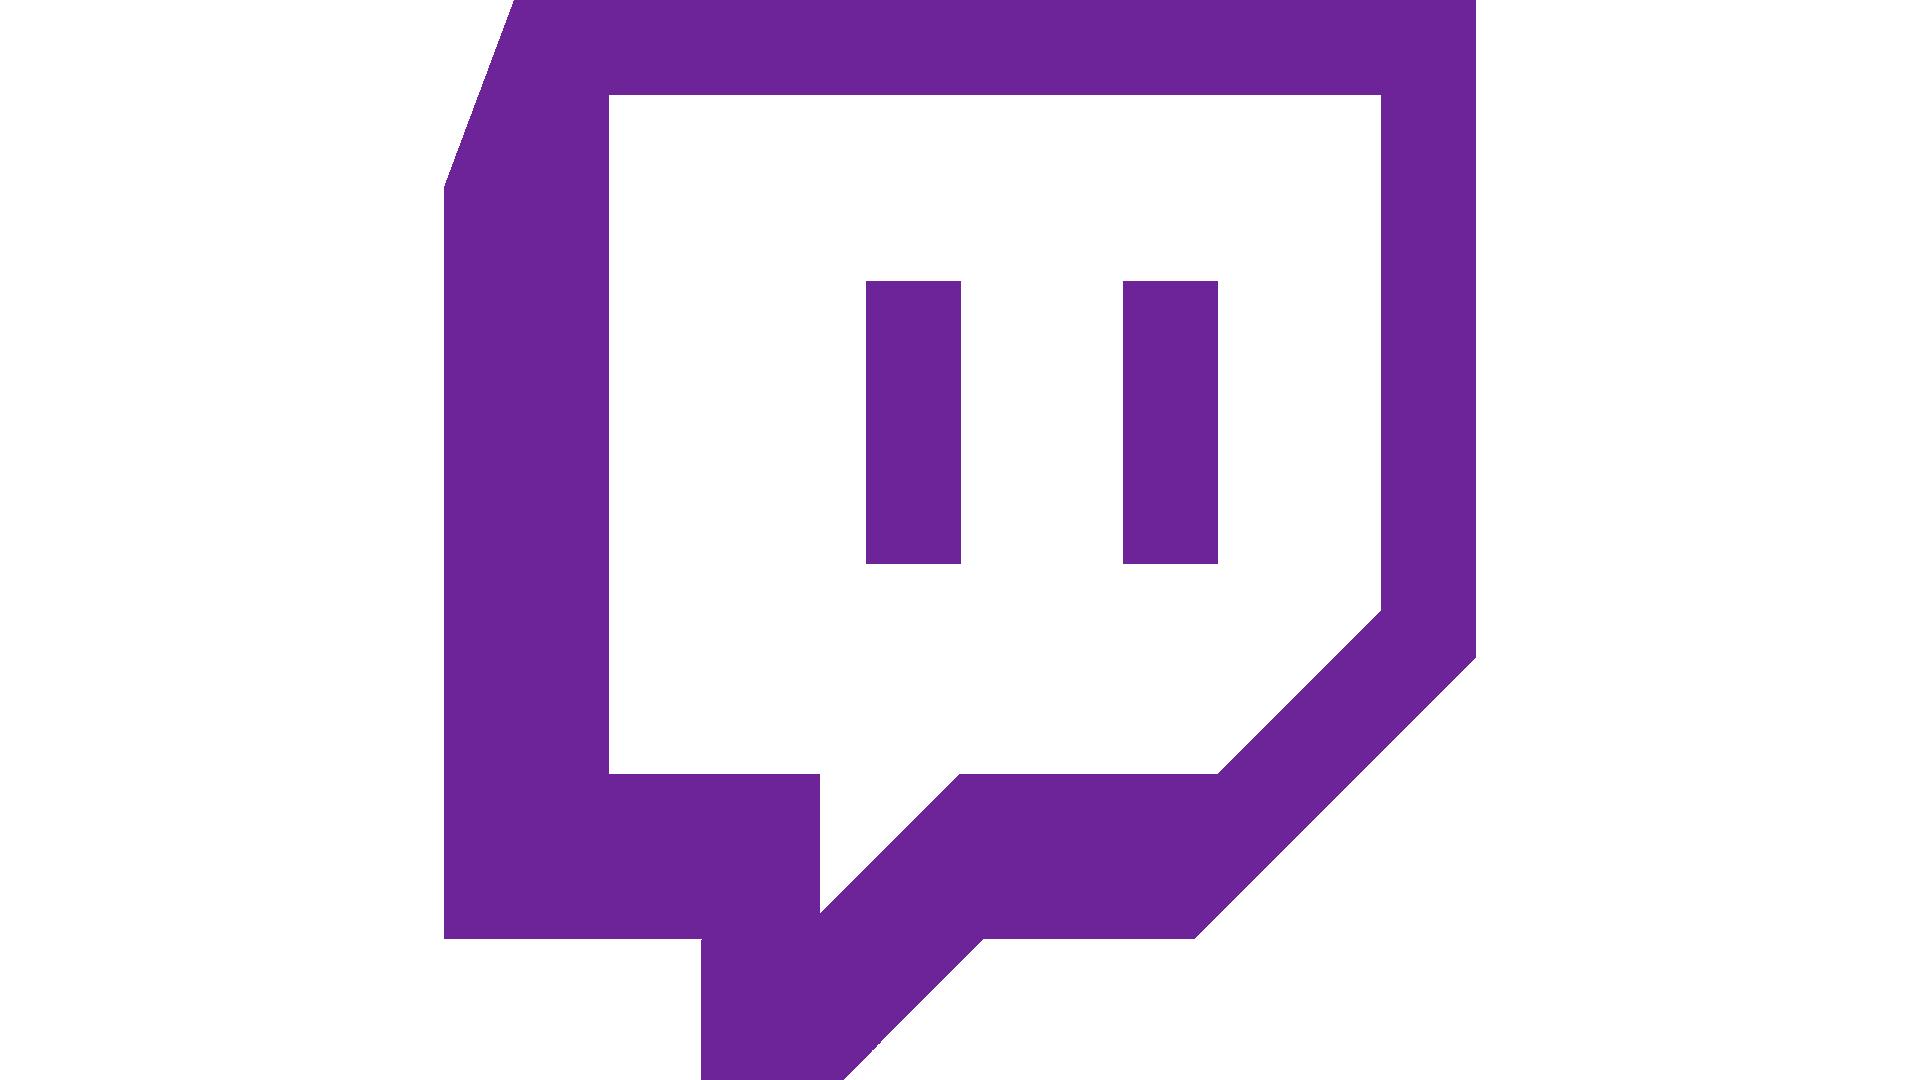 twitch app logo png #1858